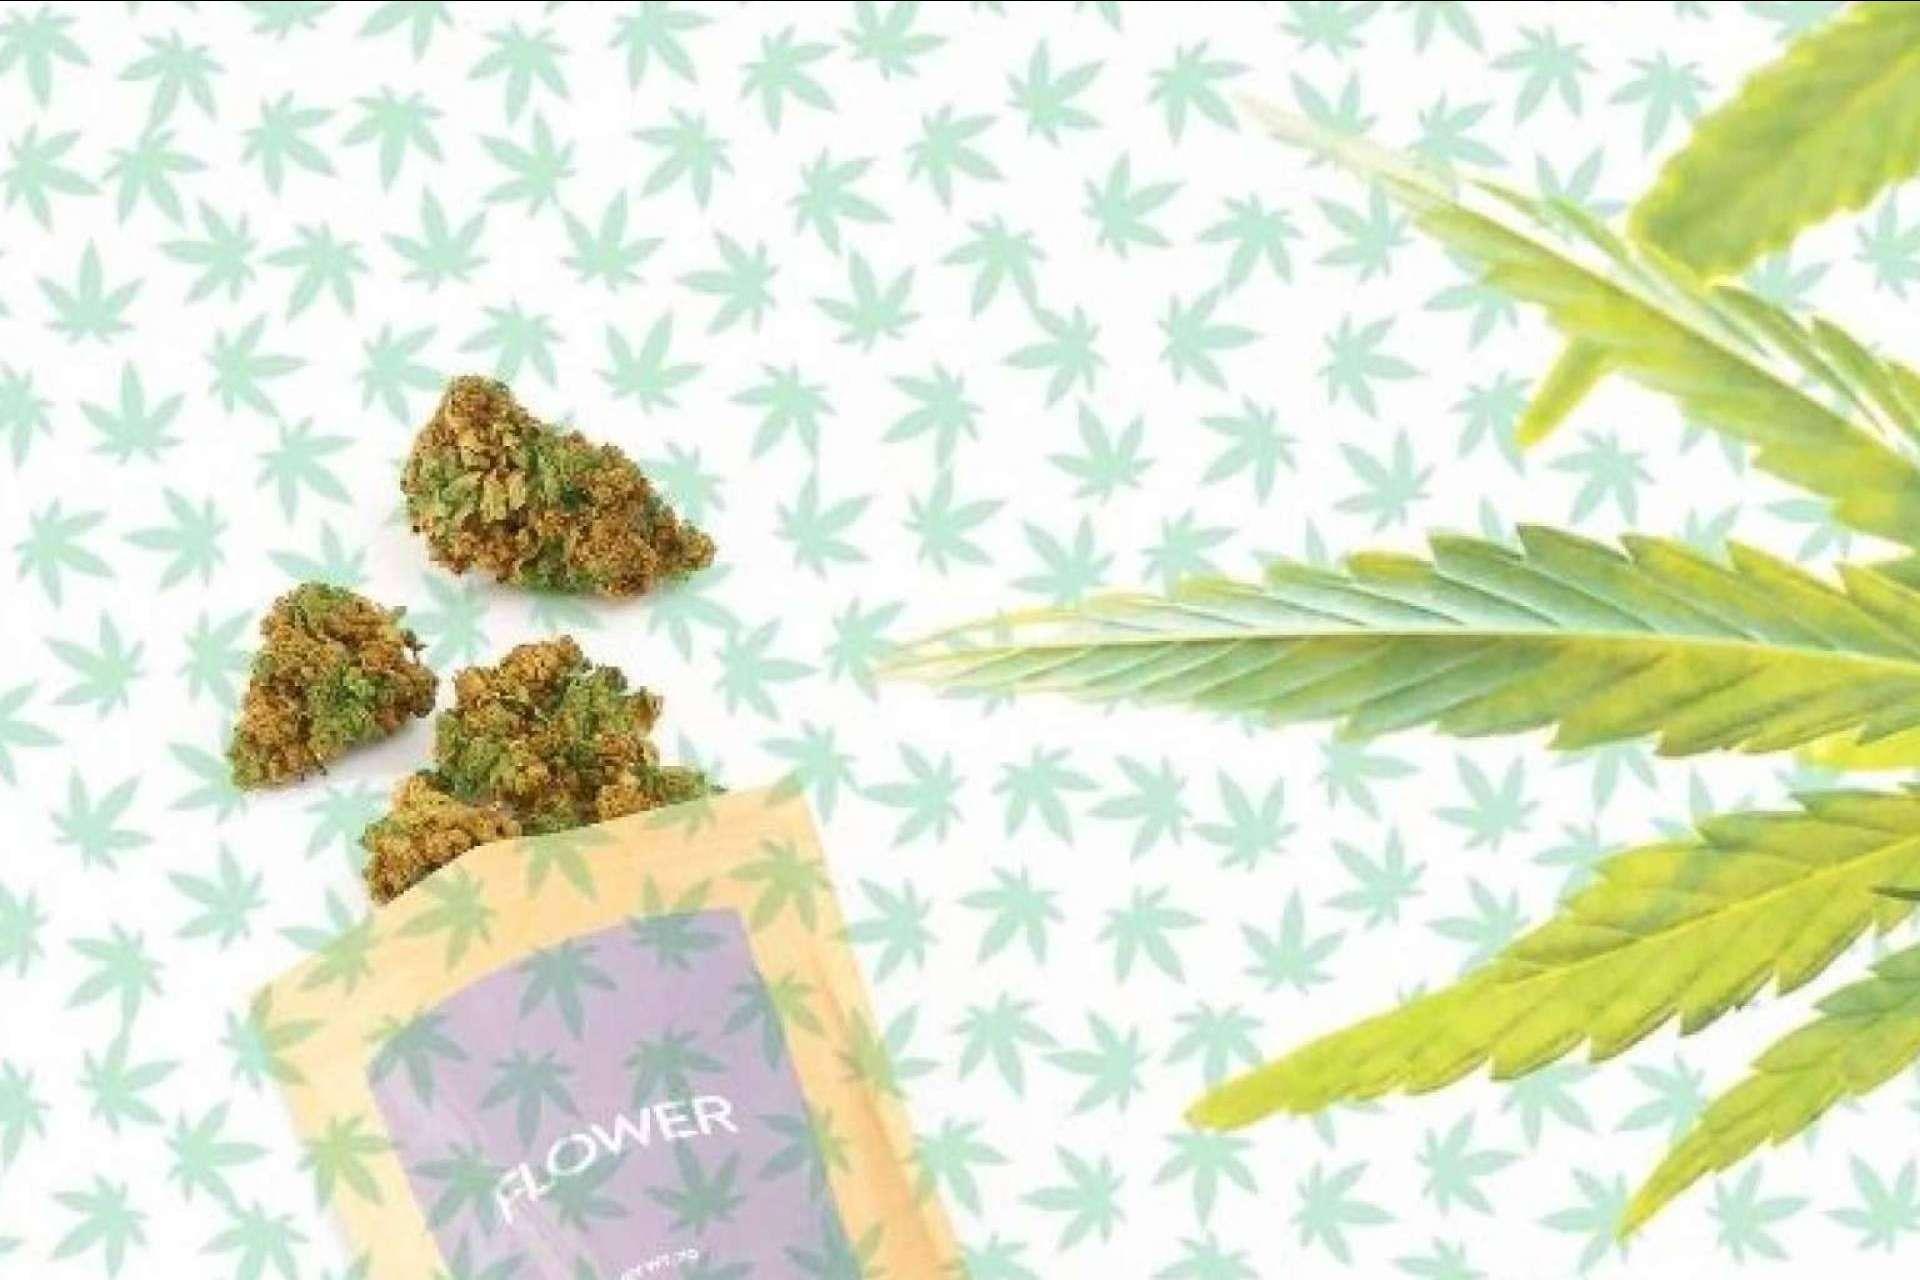 ¿Dónde comprar flores CBD online? CBD Organics